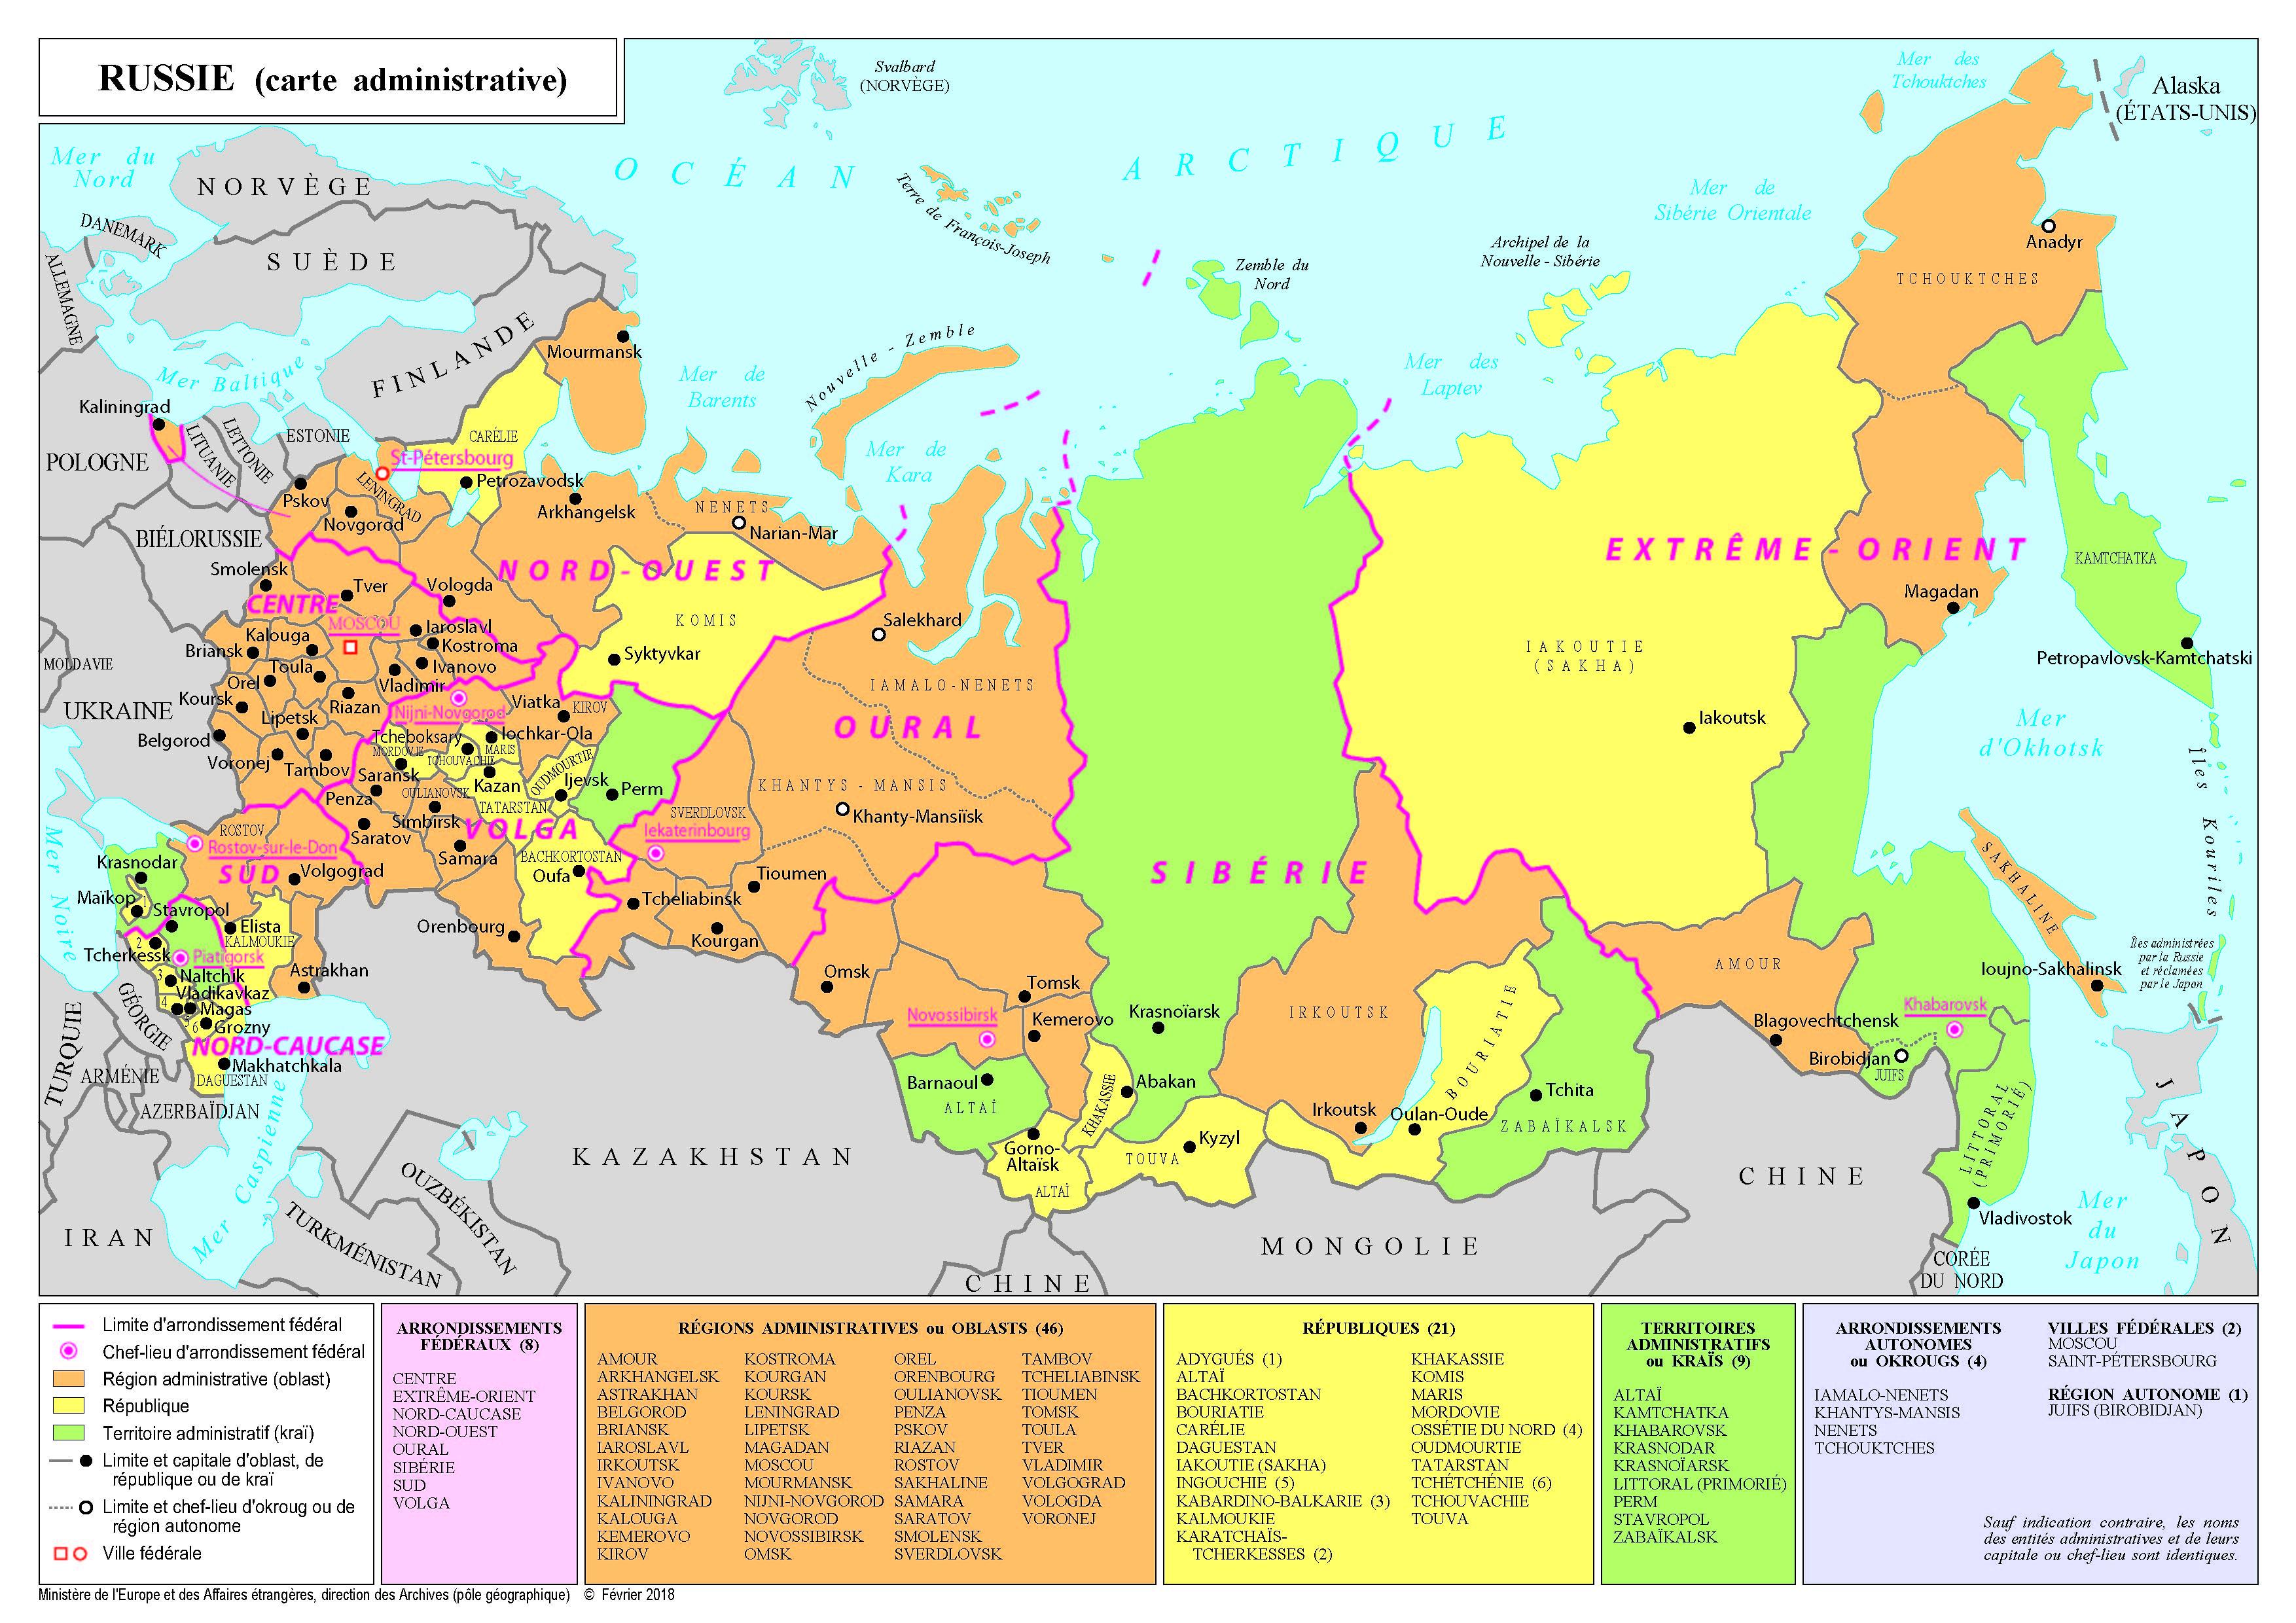 carte_russie_grande_carte_administrative_arrondissements_regions